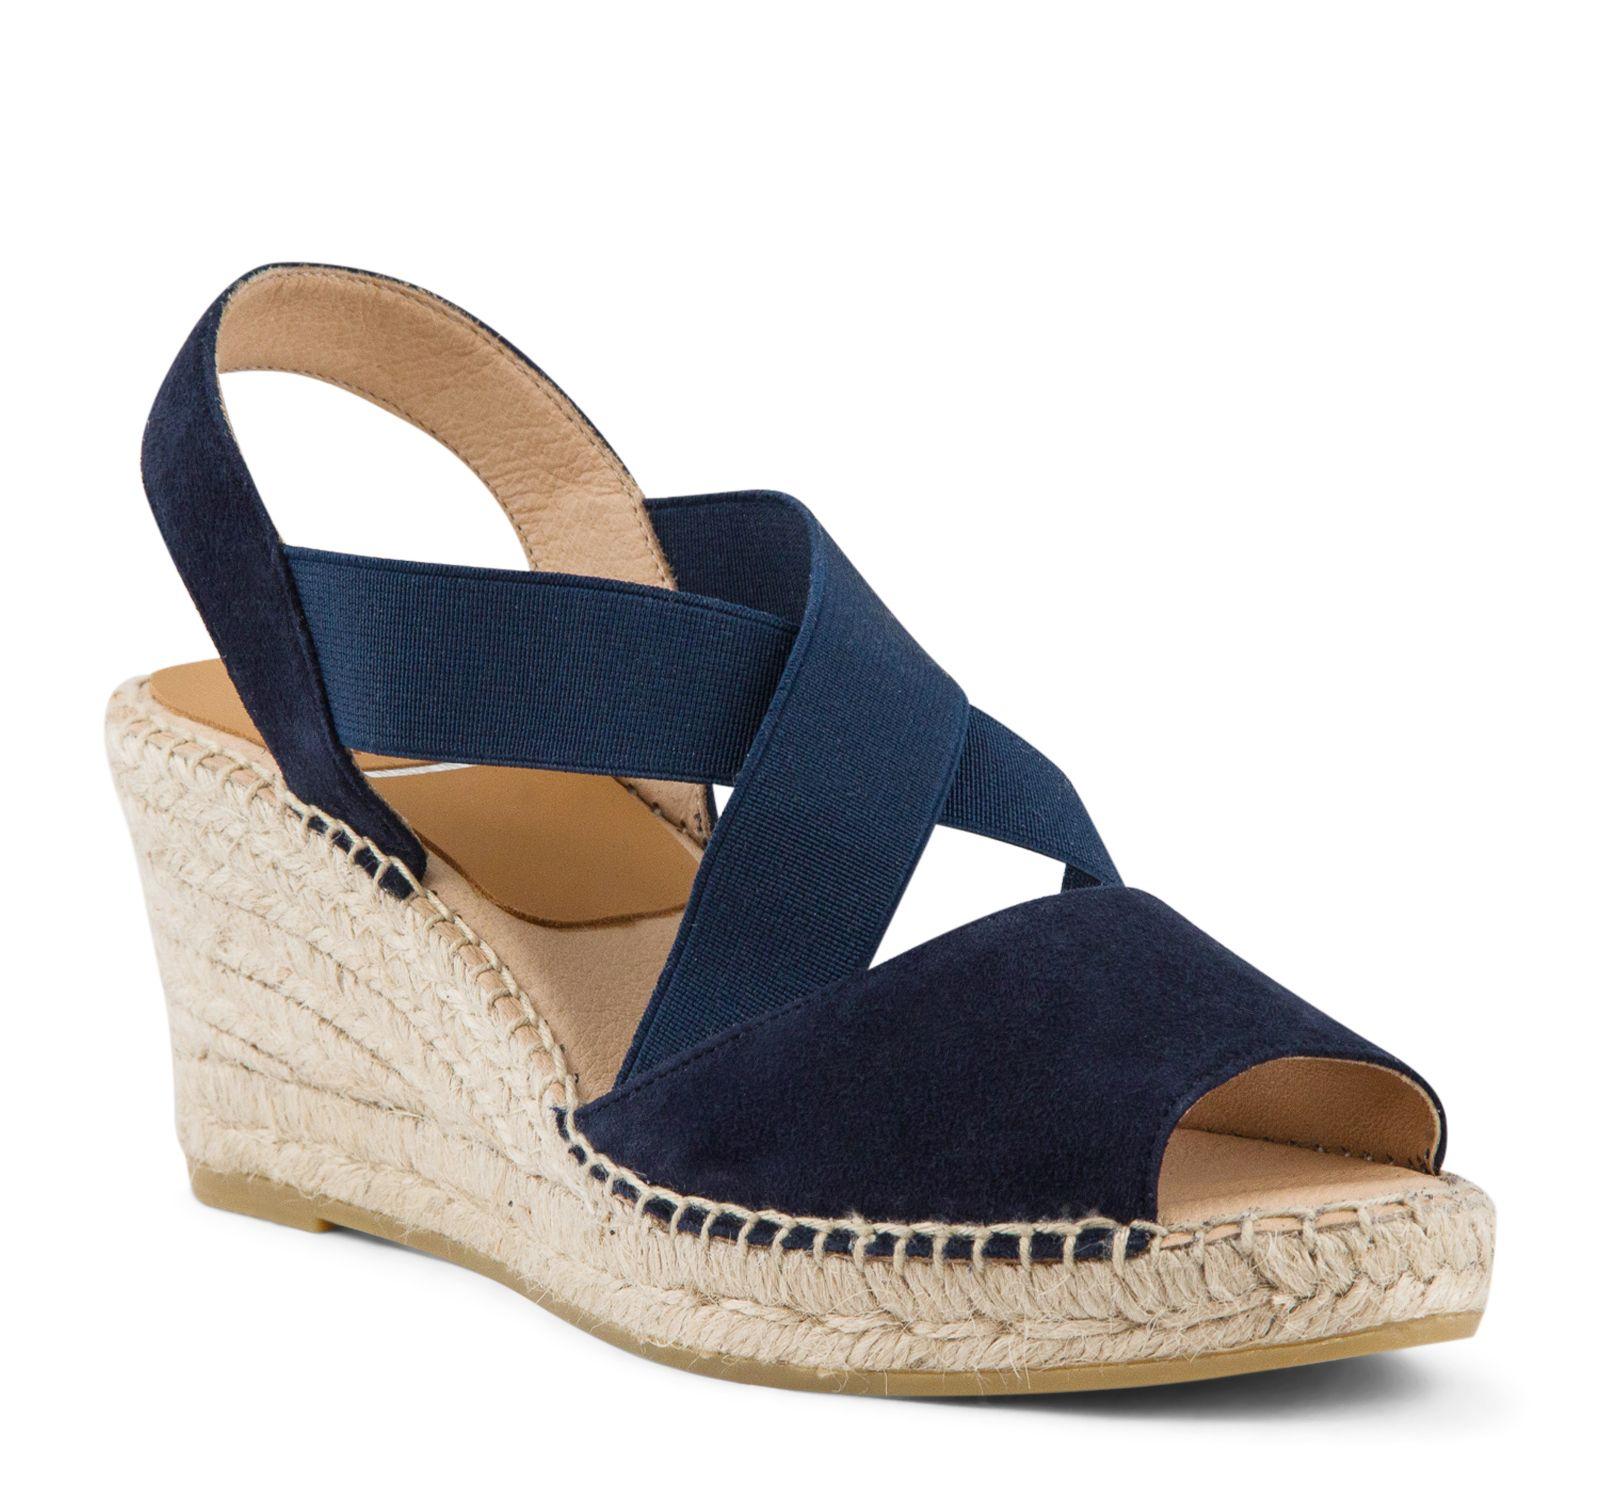 Kanna KV8071 Wedge Sandale Damens's Damens's Damens's Hudson (Navy)   Damens's Footwear ... 321fd8